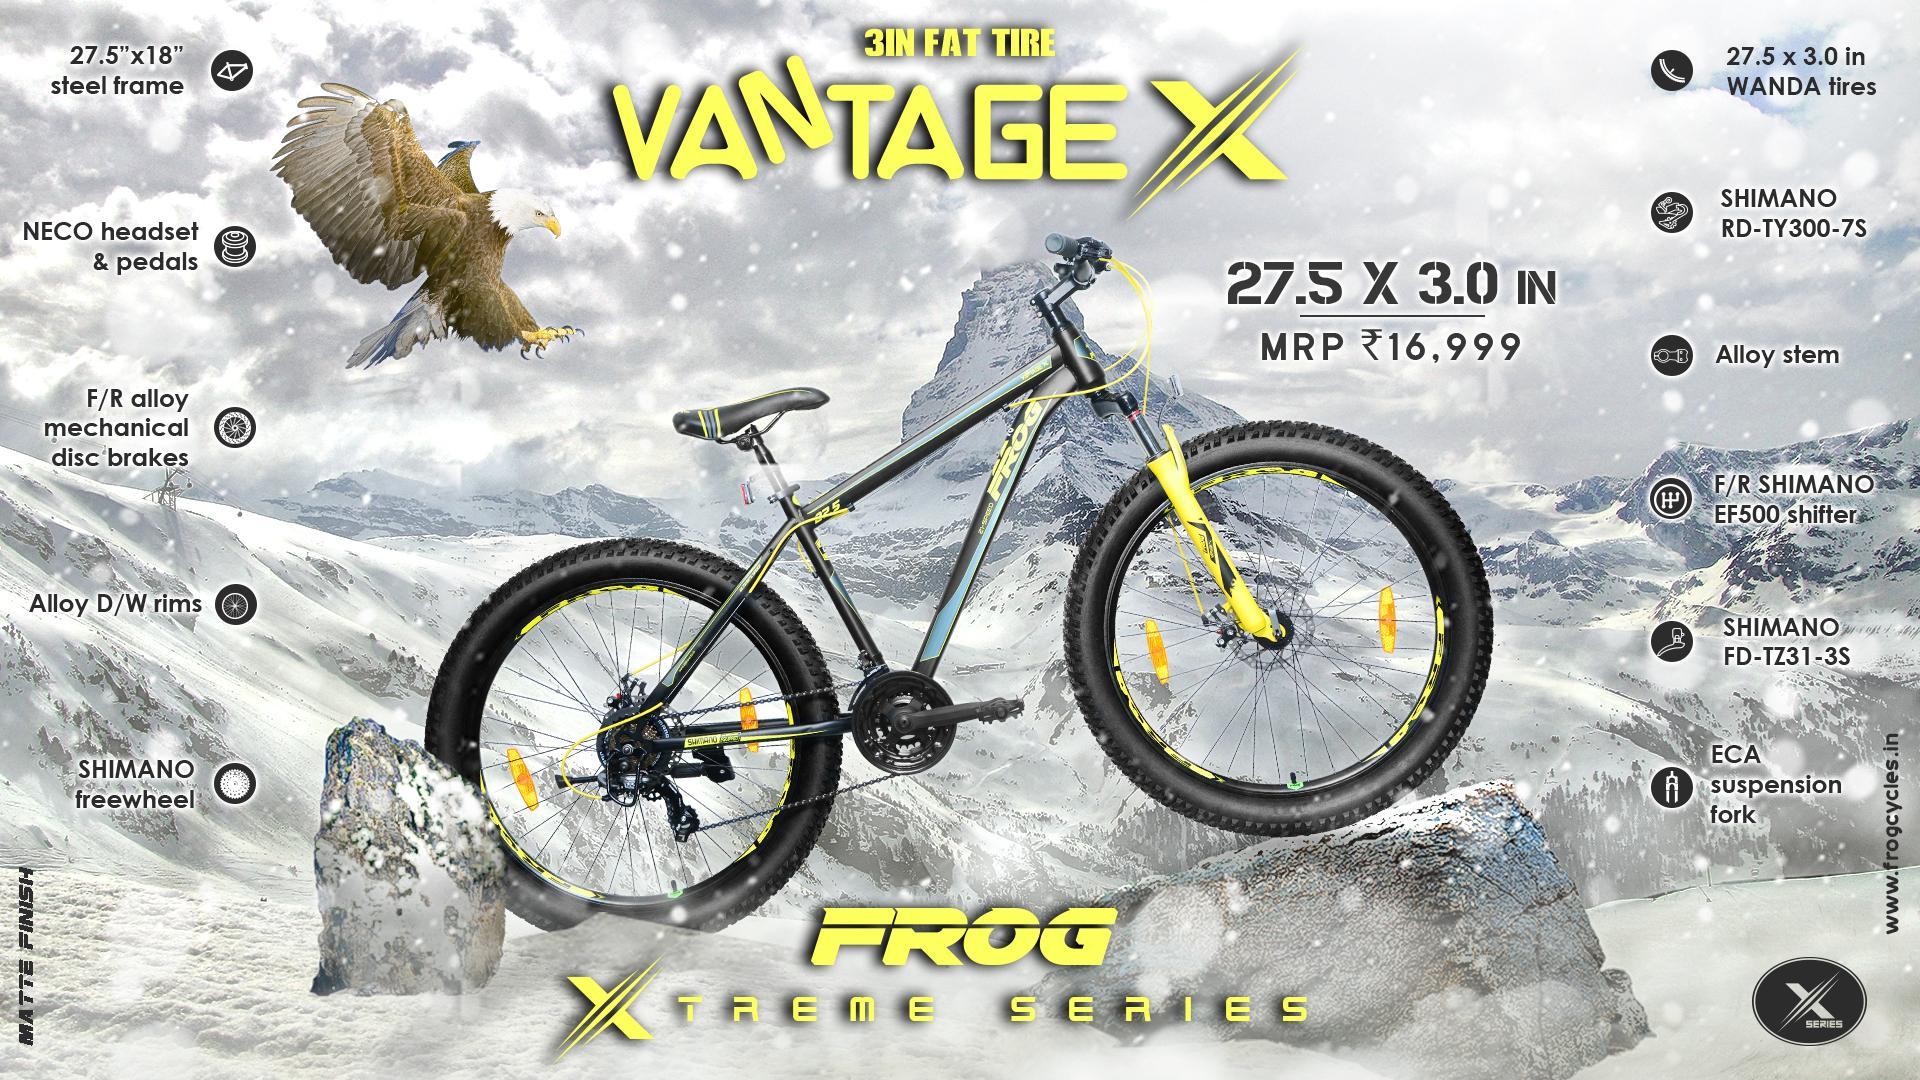 Vantage X 27 5 3 0 image 4